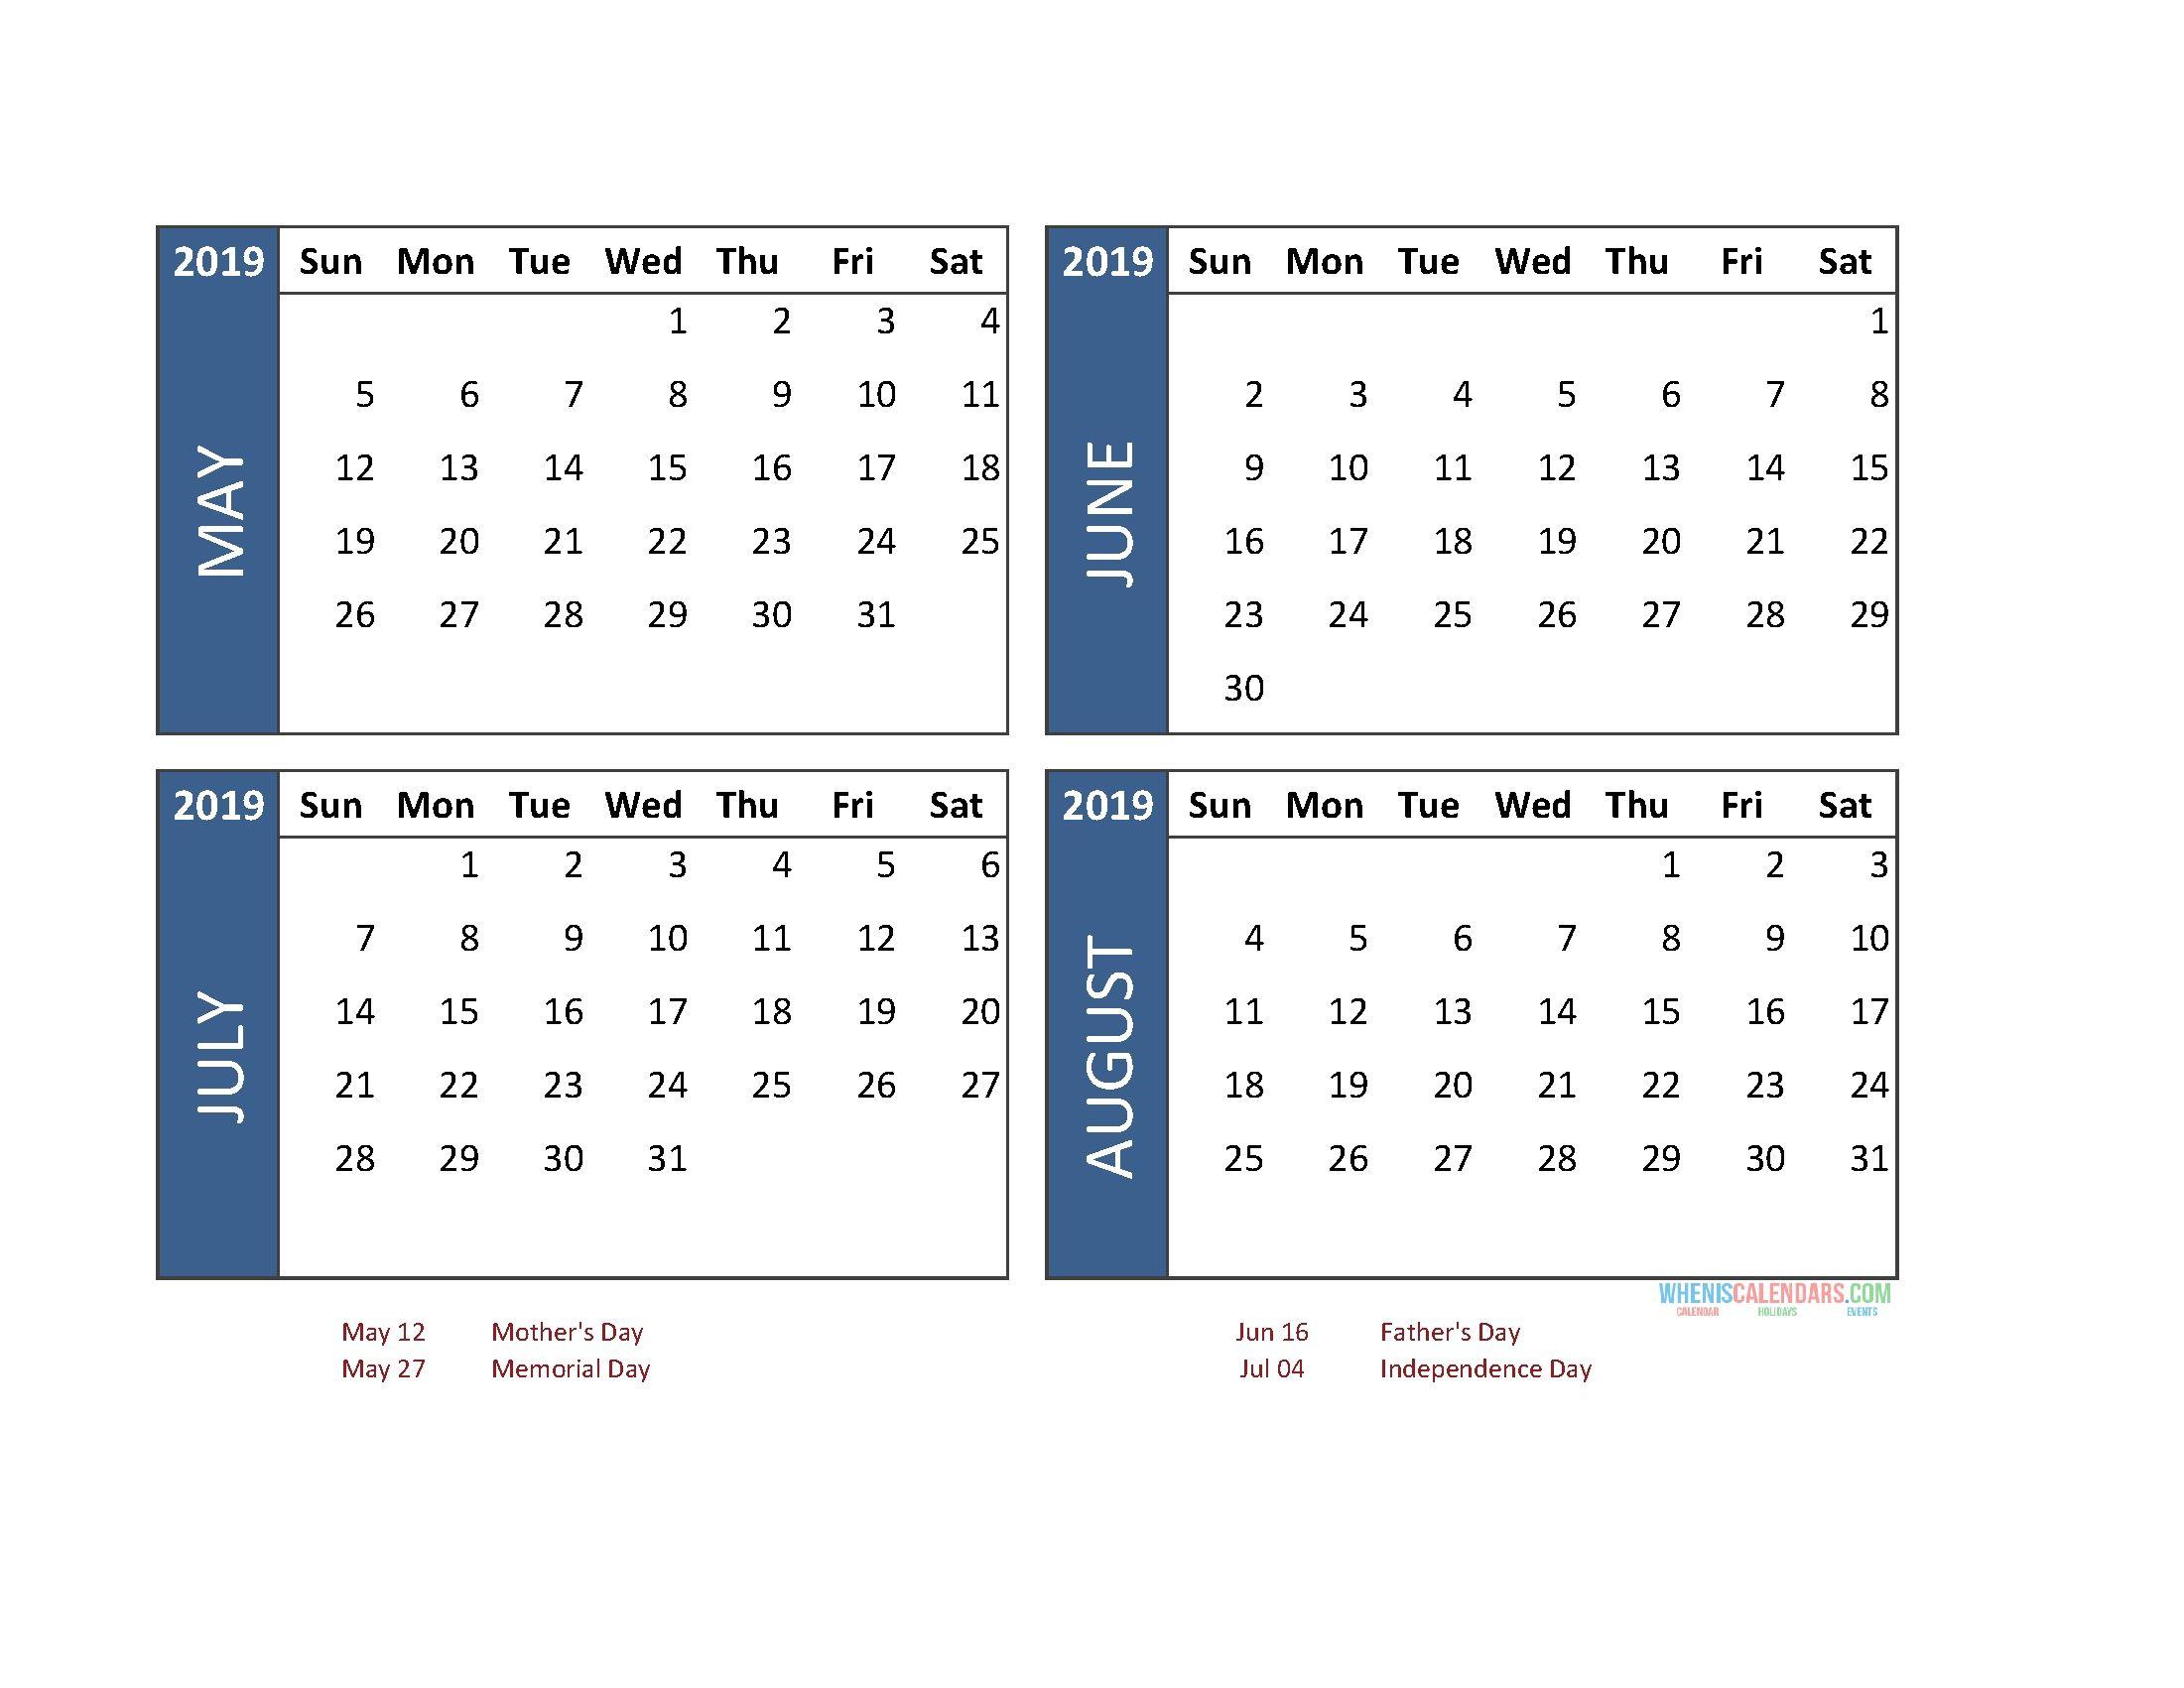 Printable 4 Month Calendar 2019 May June July August | 2019 within Free Printable 4 Month Calendar